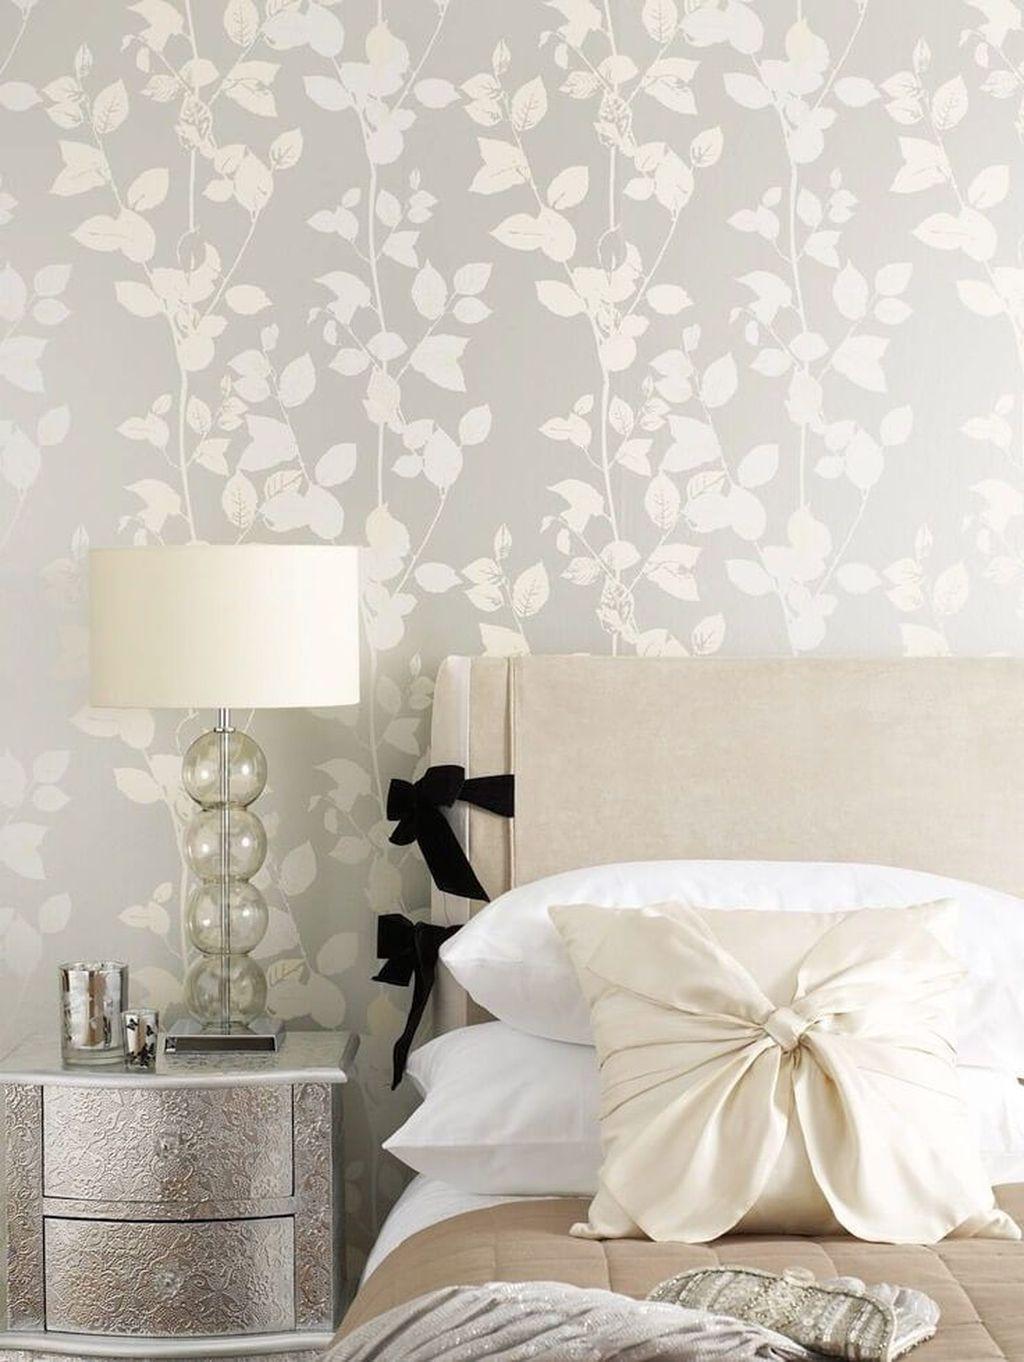 40+ Fabulous Bedroom Wallpaper Design Ideas For You